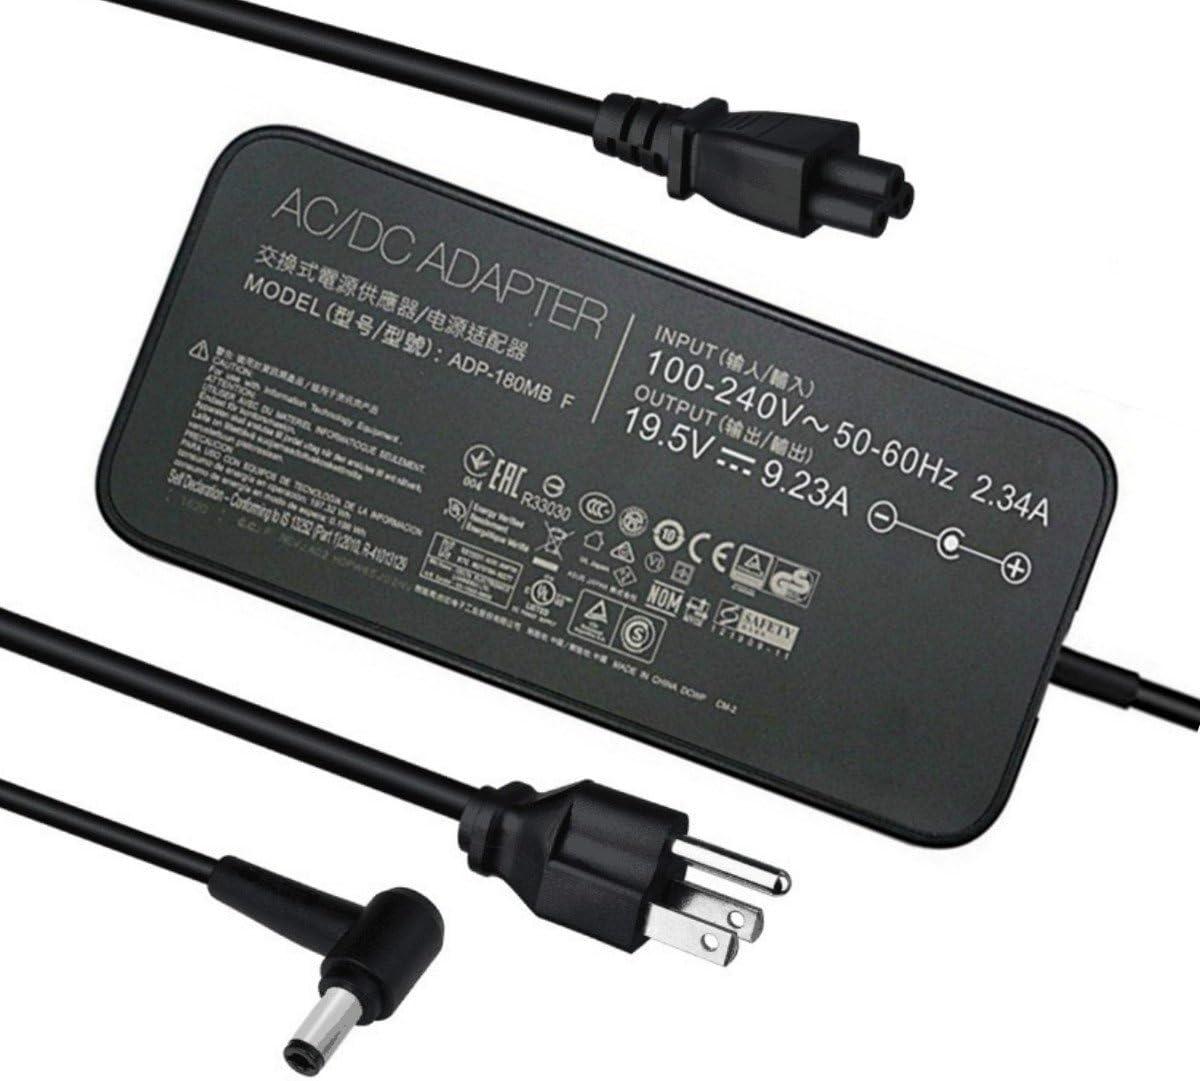 USED Original Asus ADP-180MB F Power Adapter Cable Cord Box Adaptor